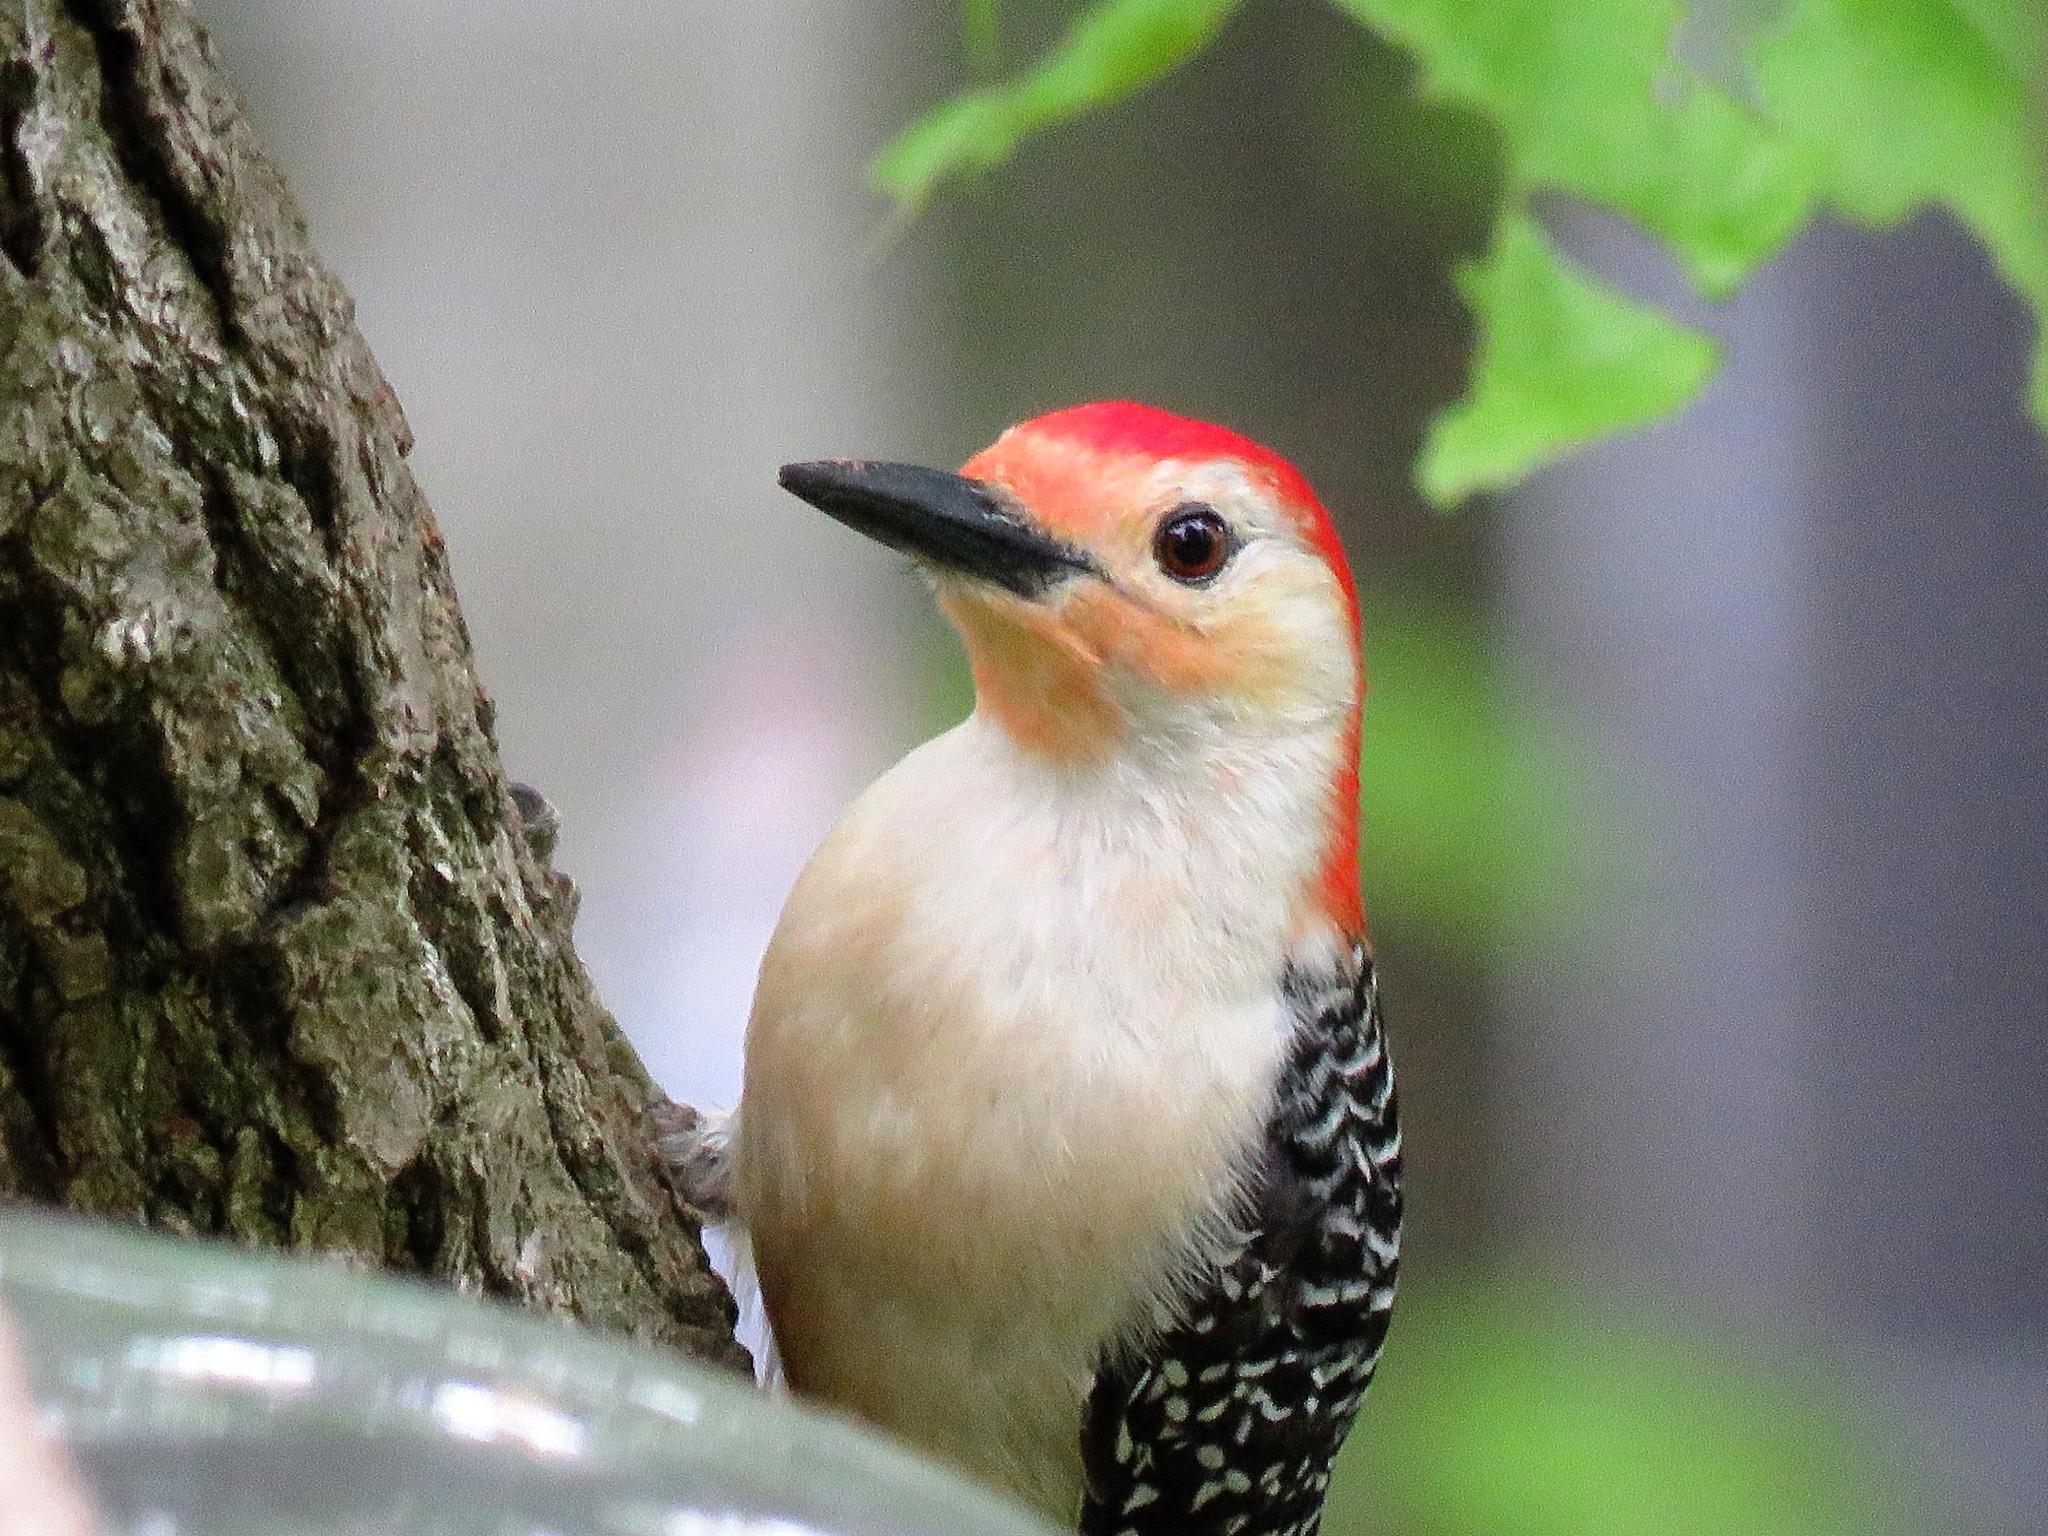 Backyard red-bellied woodpecker by Marygallo